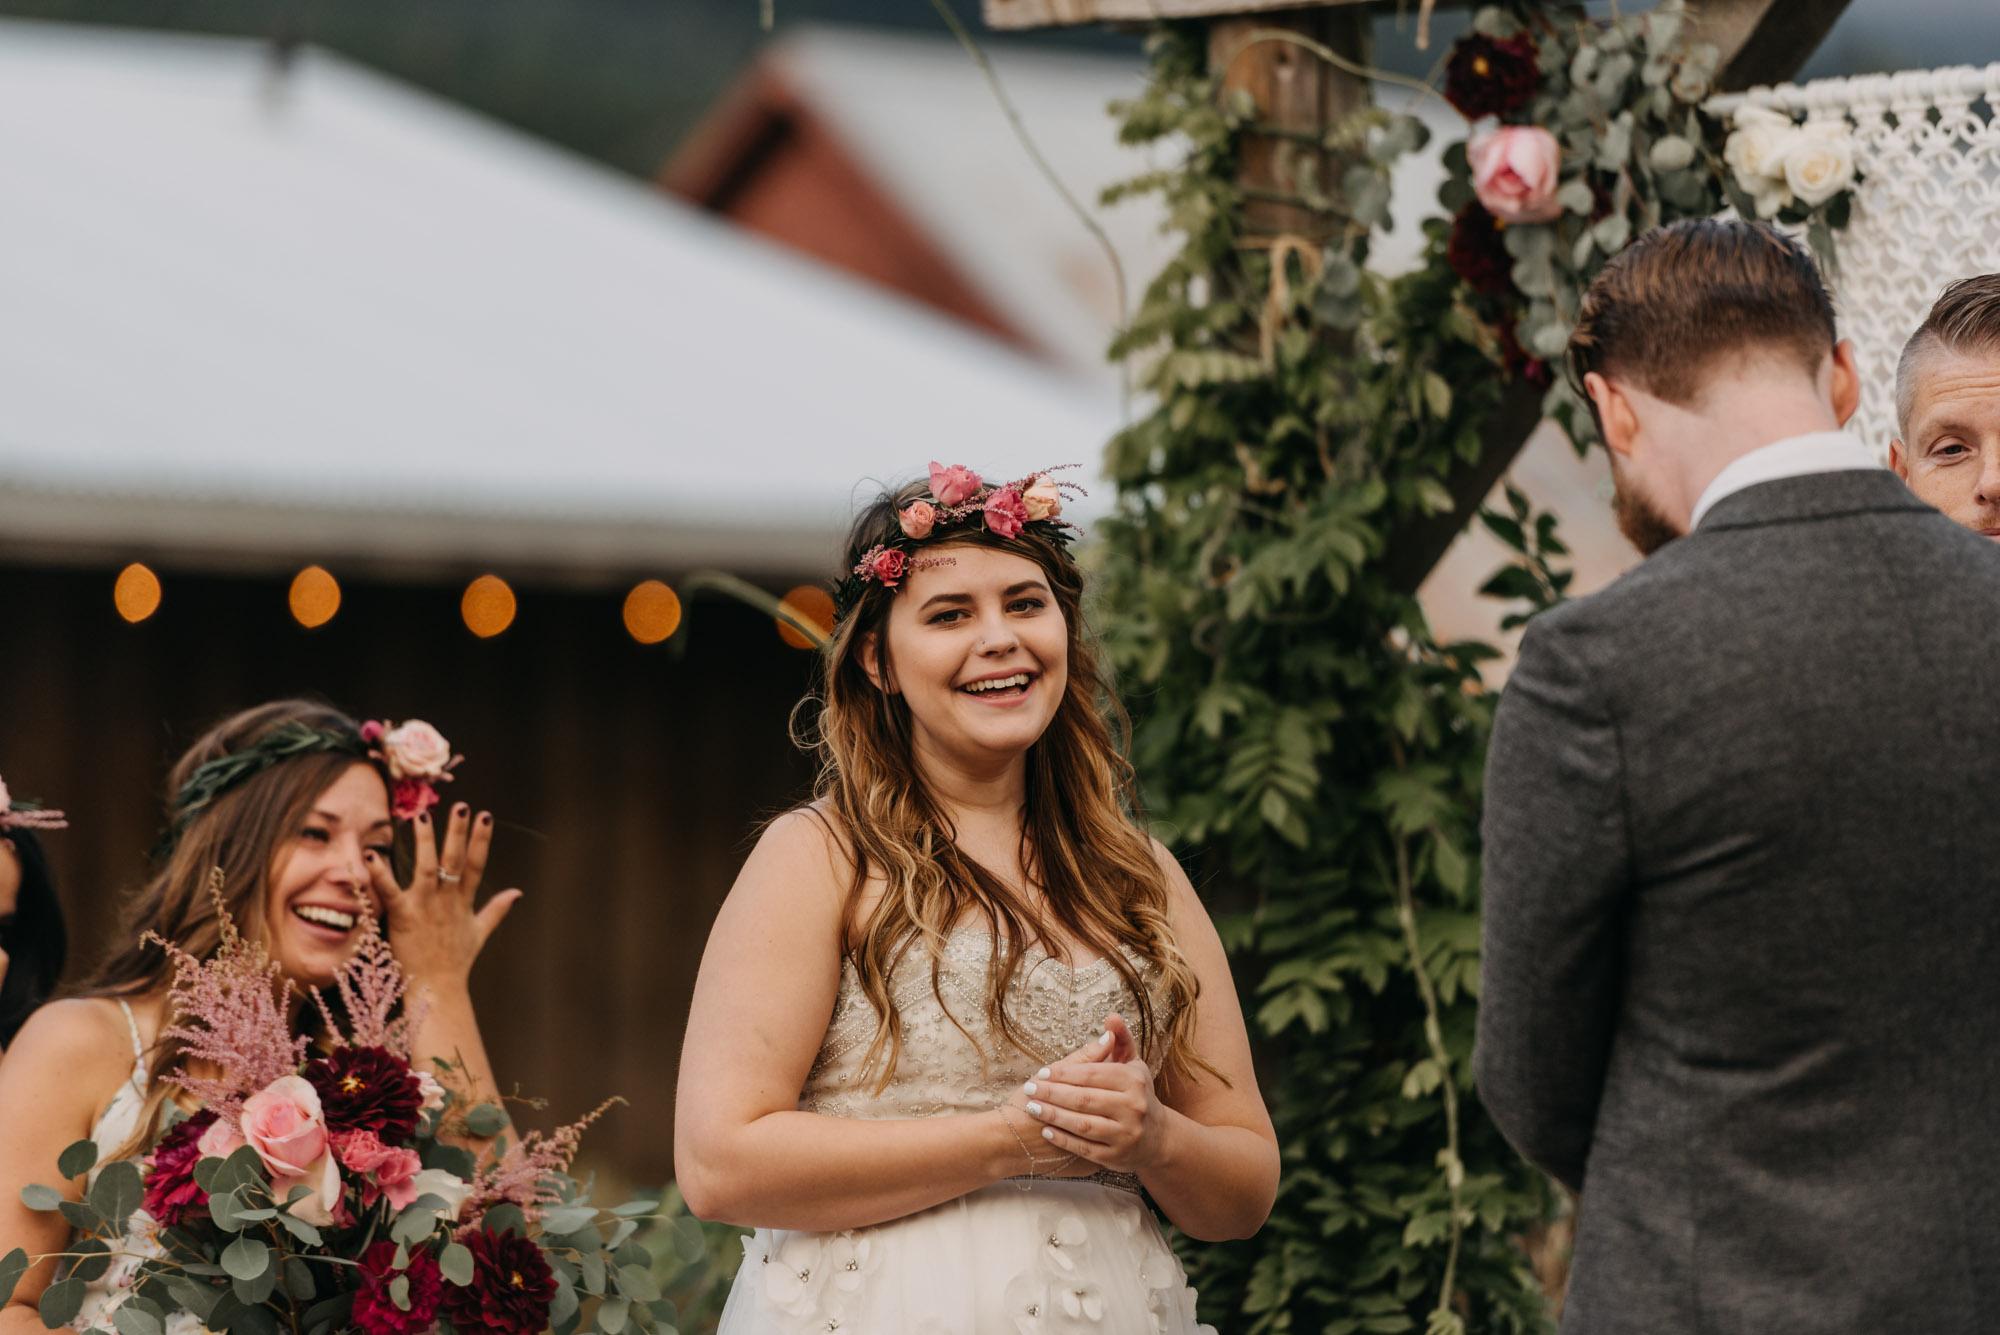 Outdoor-Summer-Ceremony-Washington-Wedding-Rainbow-9092.jpg